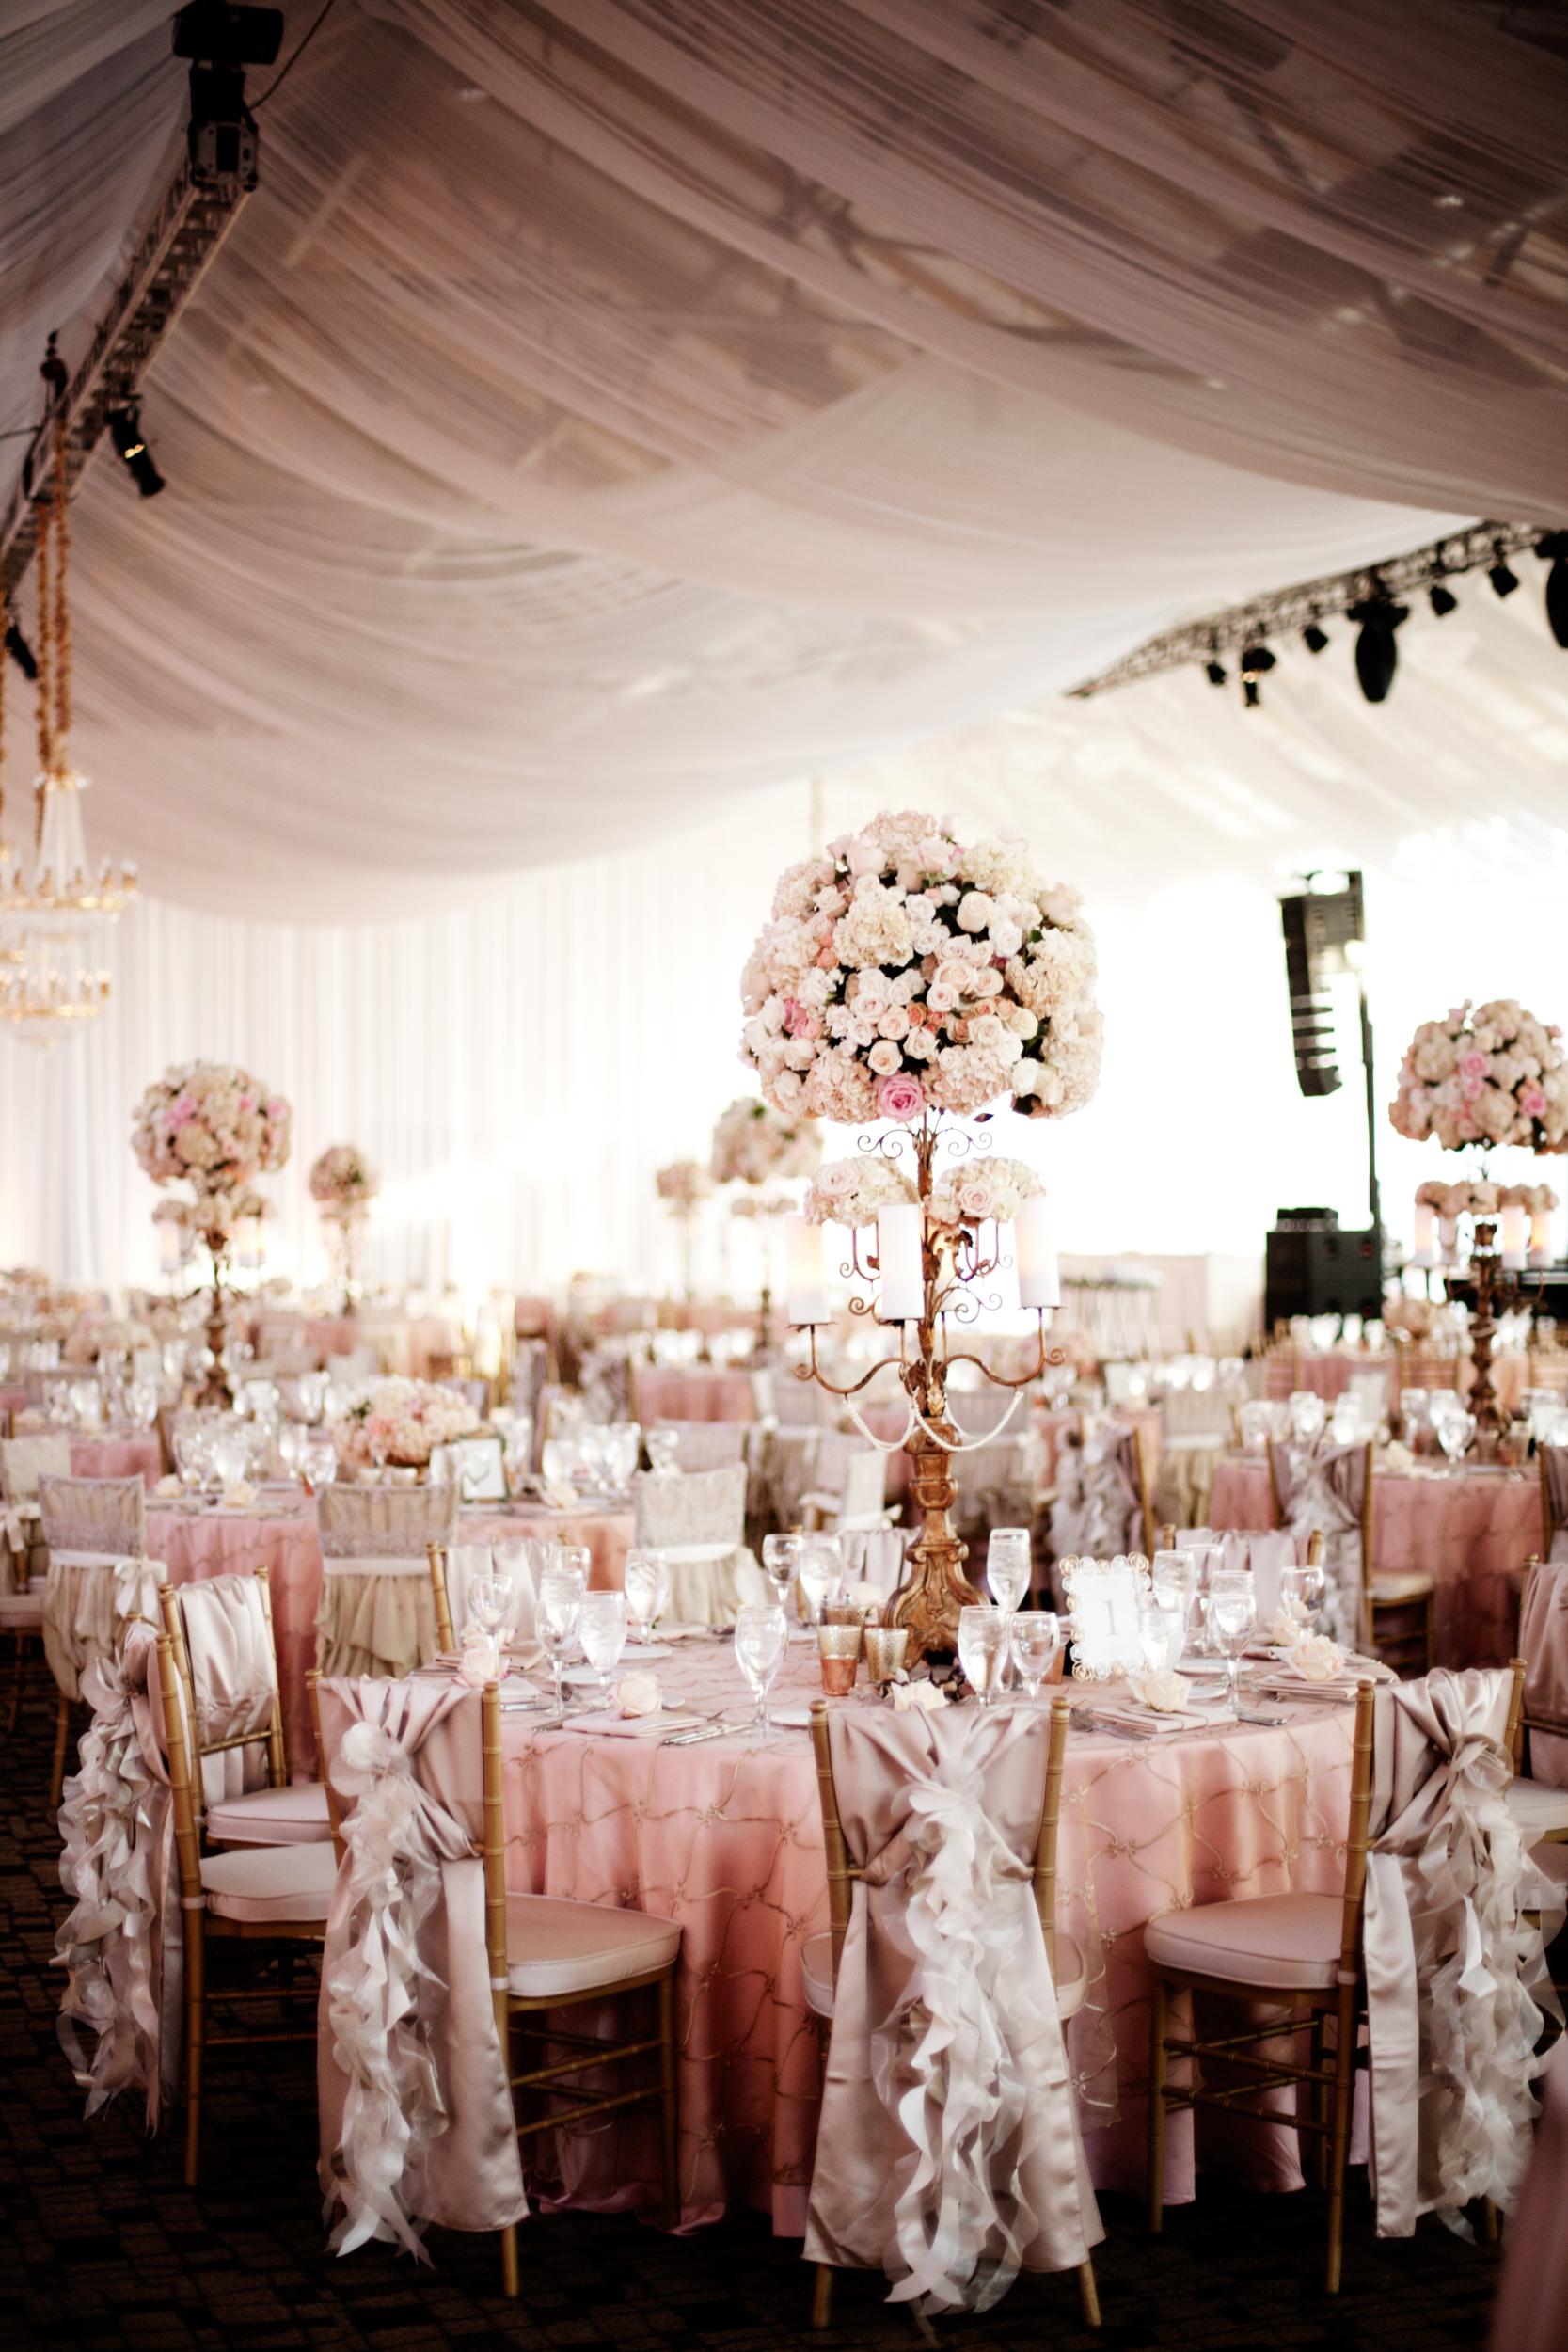 Ceci_New_York_Ceci_Style_Ceci_Johnson_Luxury_Lifestyle_Floral_Lace_Wedding_Letterpress_Inspiration_Design_Custom_Couture_Personalized_Invitations_-128.jpg